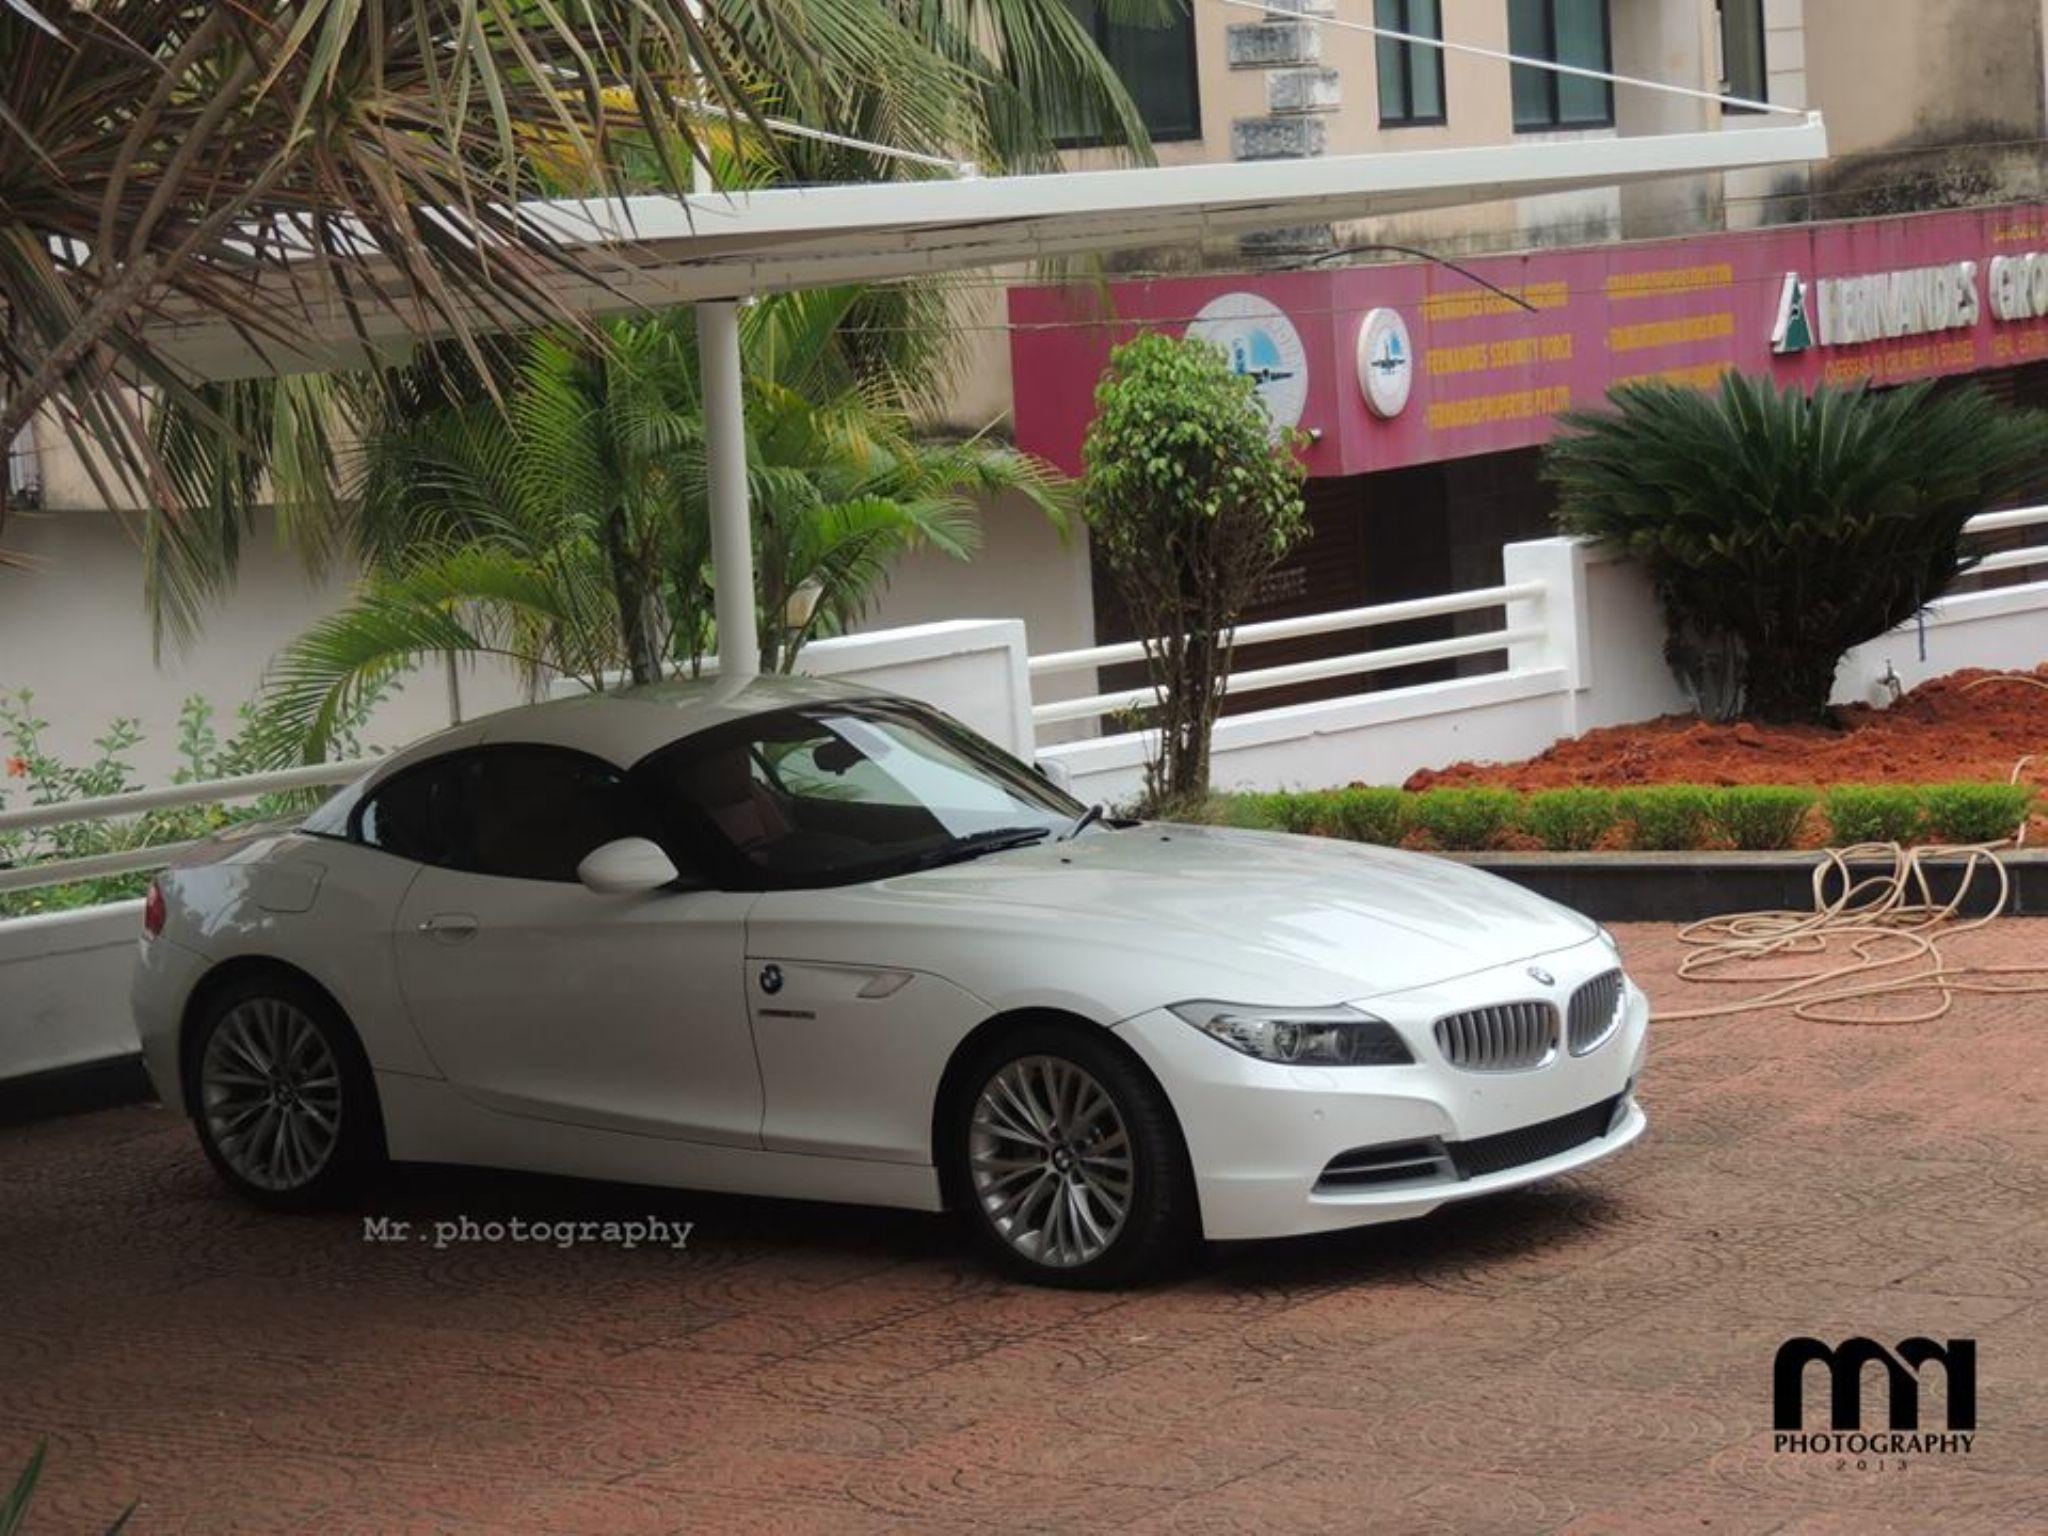 BMW Z4 TOP VIEW  by sanadrahman (Mr.photography mangalore)